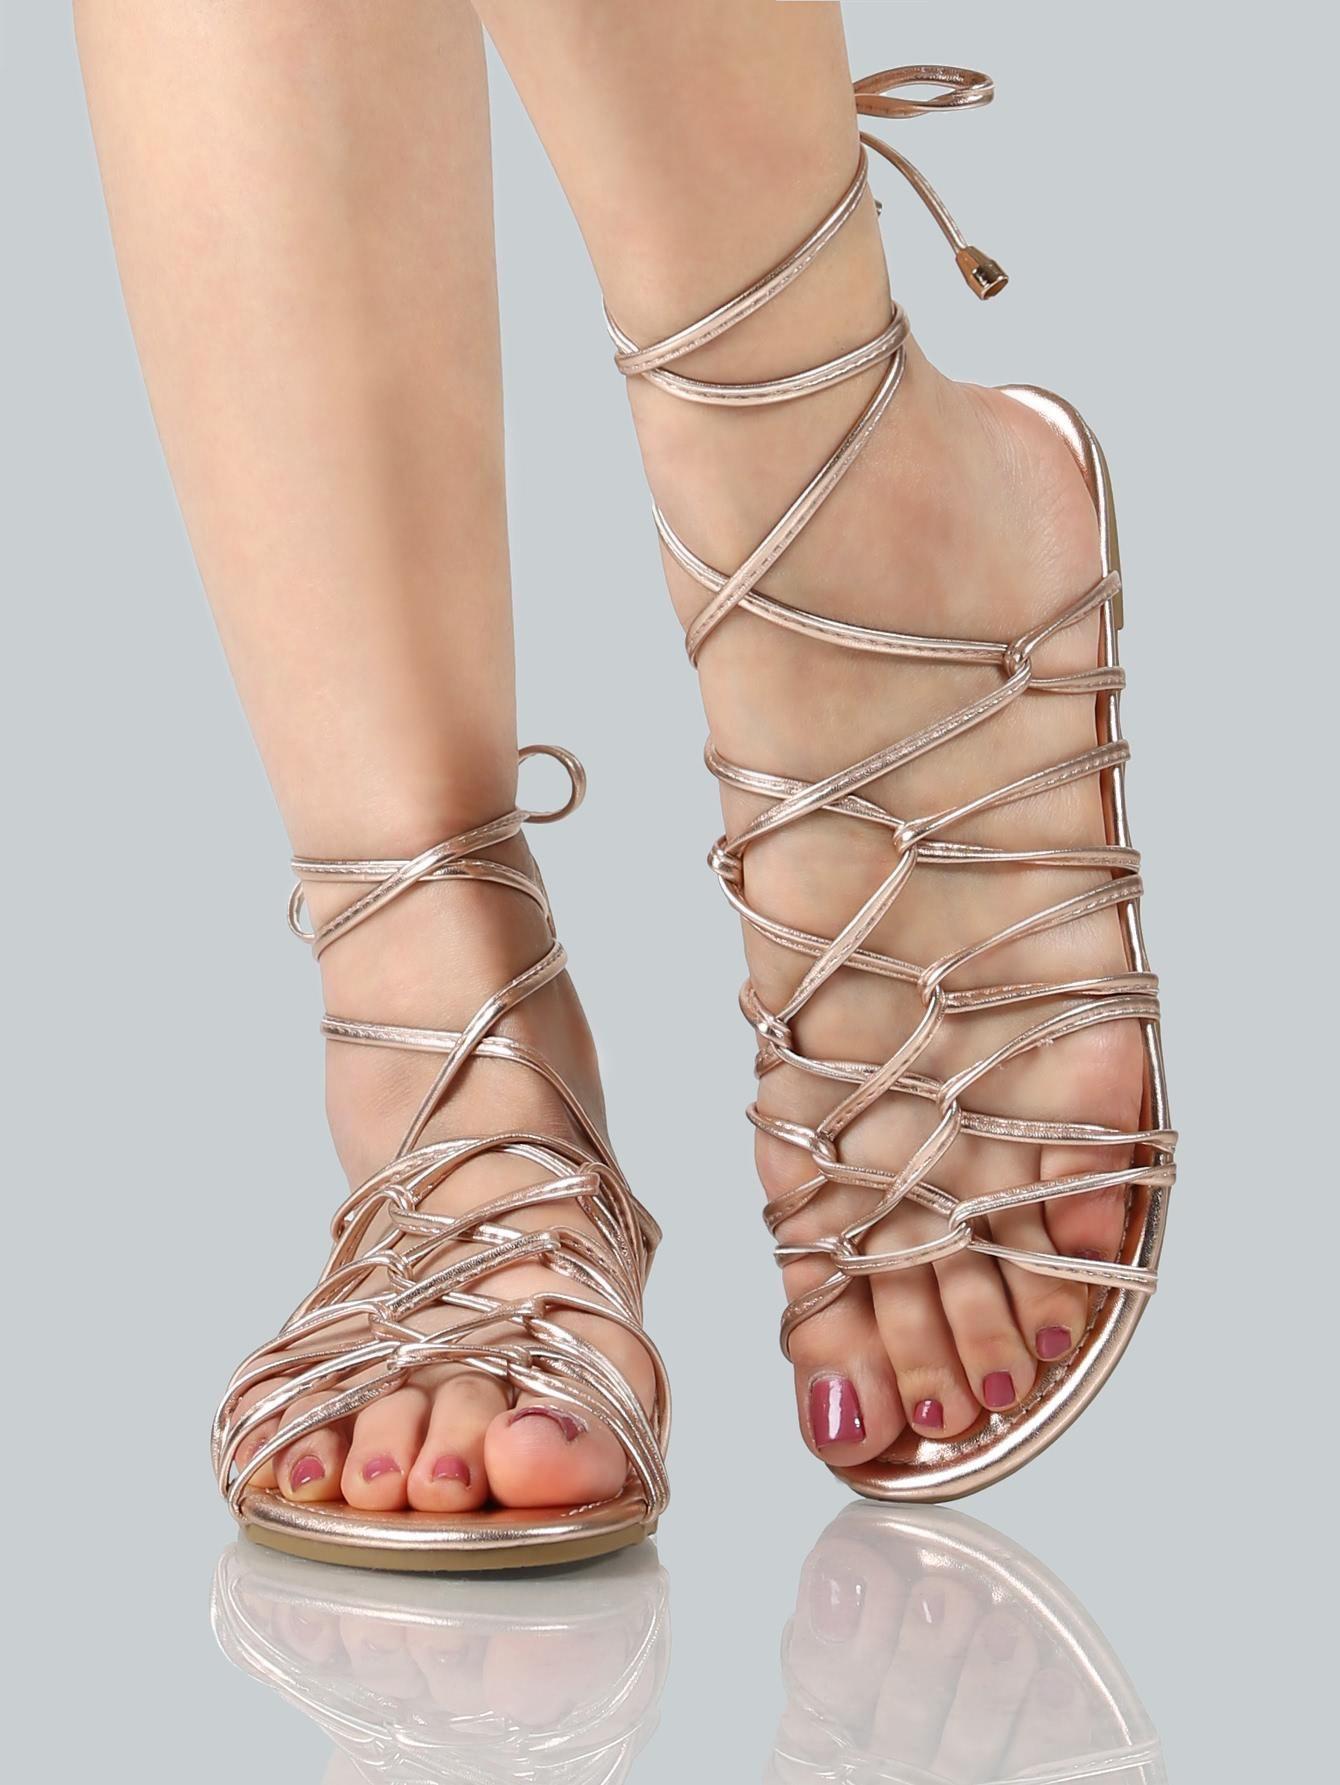 6f7f881827d8f1 MakeMeChic - MAKEMECHIC Metallic Super Strappy Sandals ROSE GOLD -  AdoreWe.com